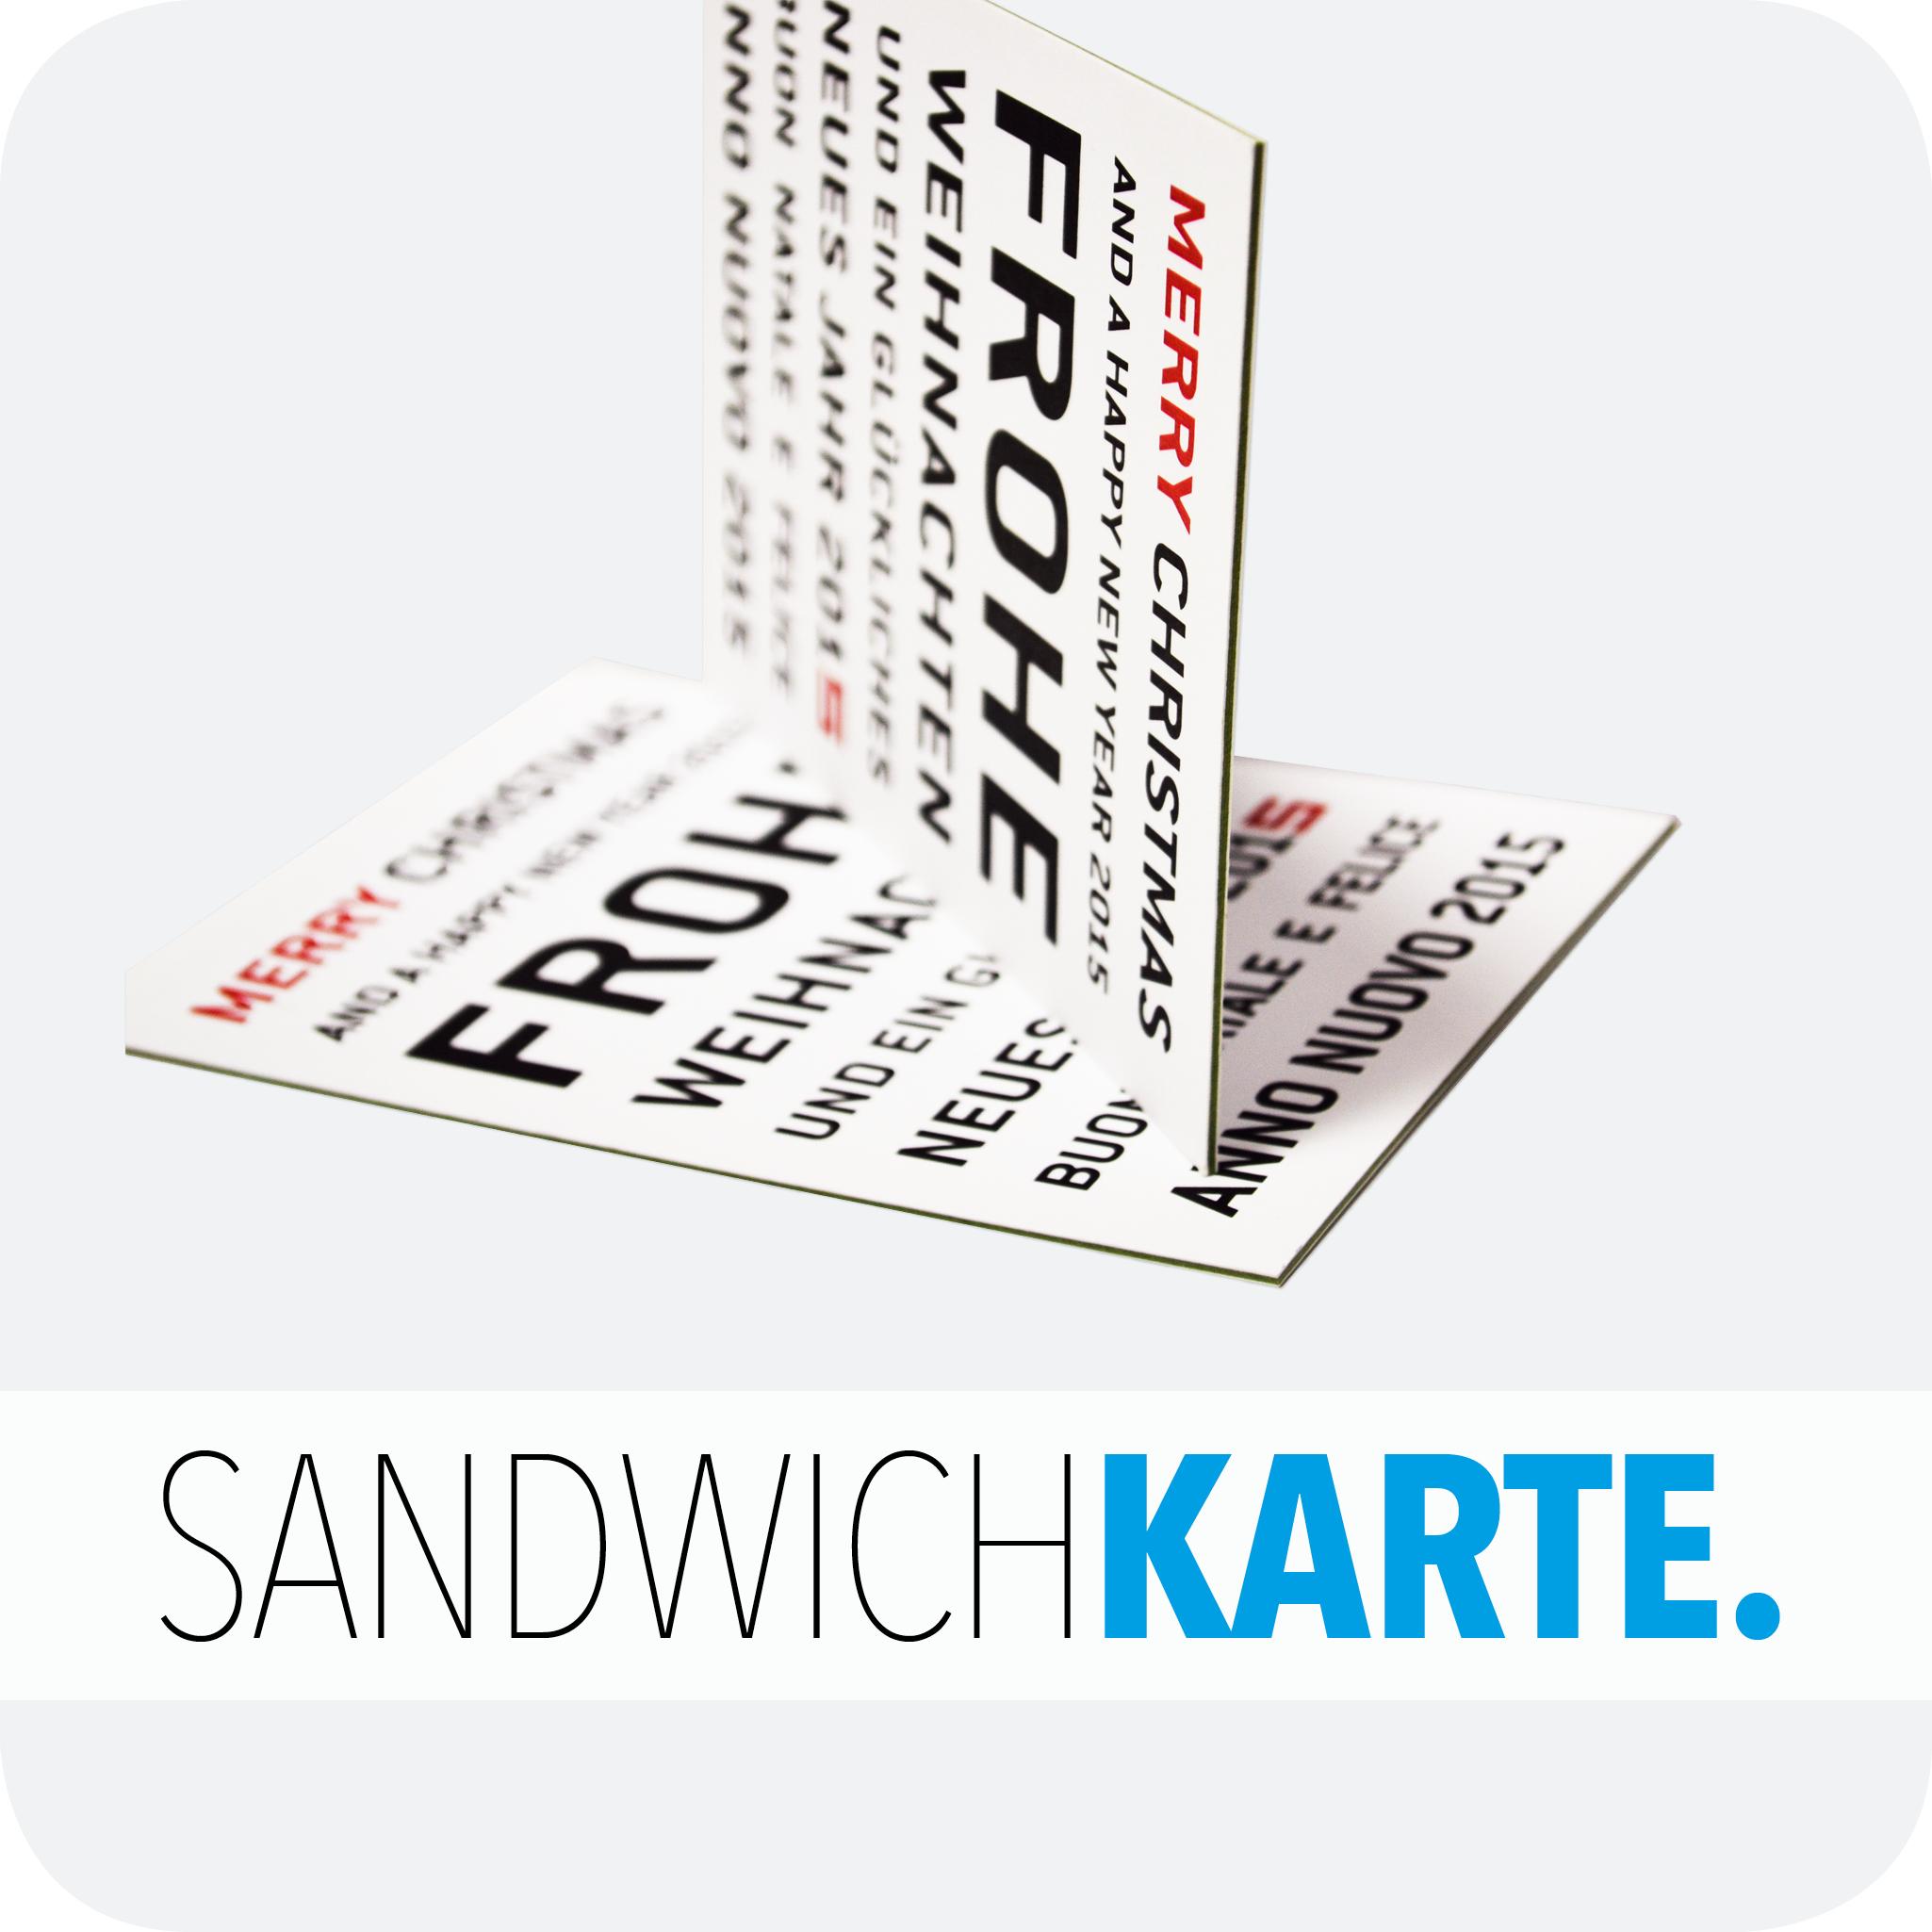 Sandwichkarte